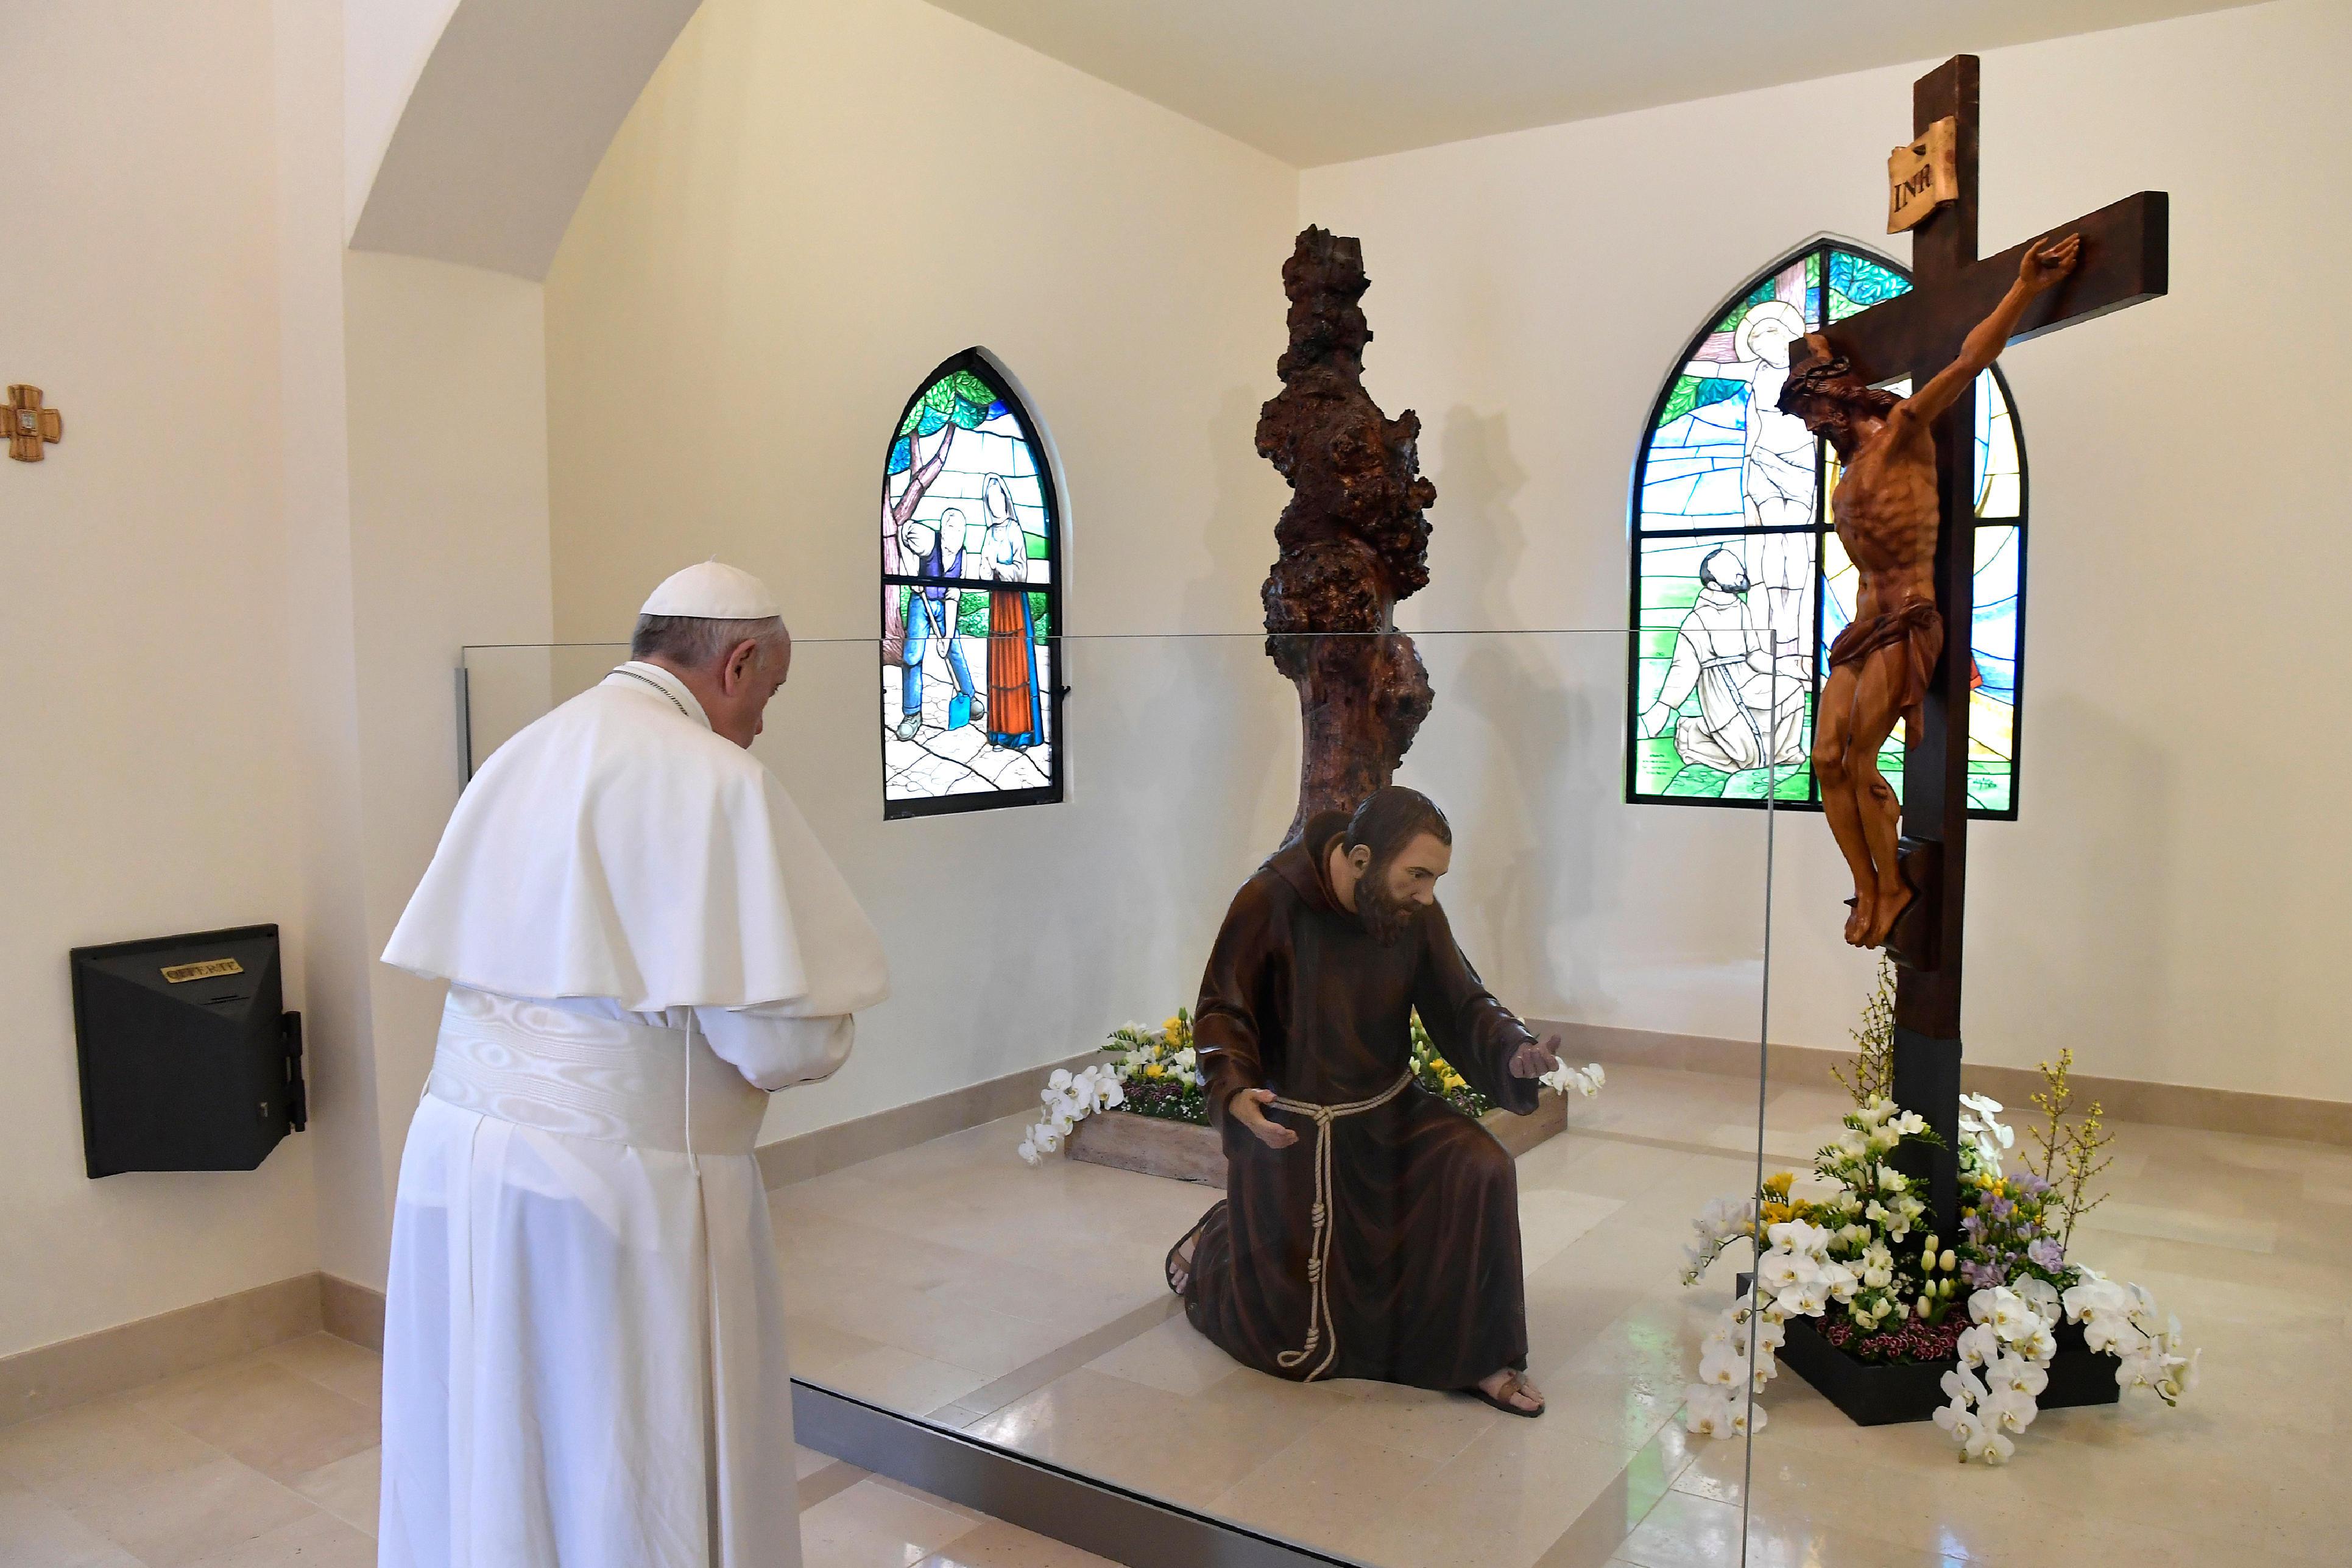 Visite à Pietrelcina, l'orme des stigmates © Vatican Media